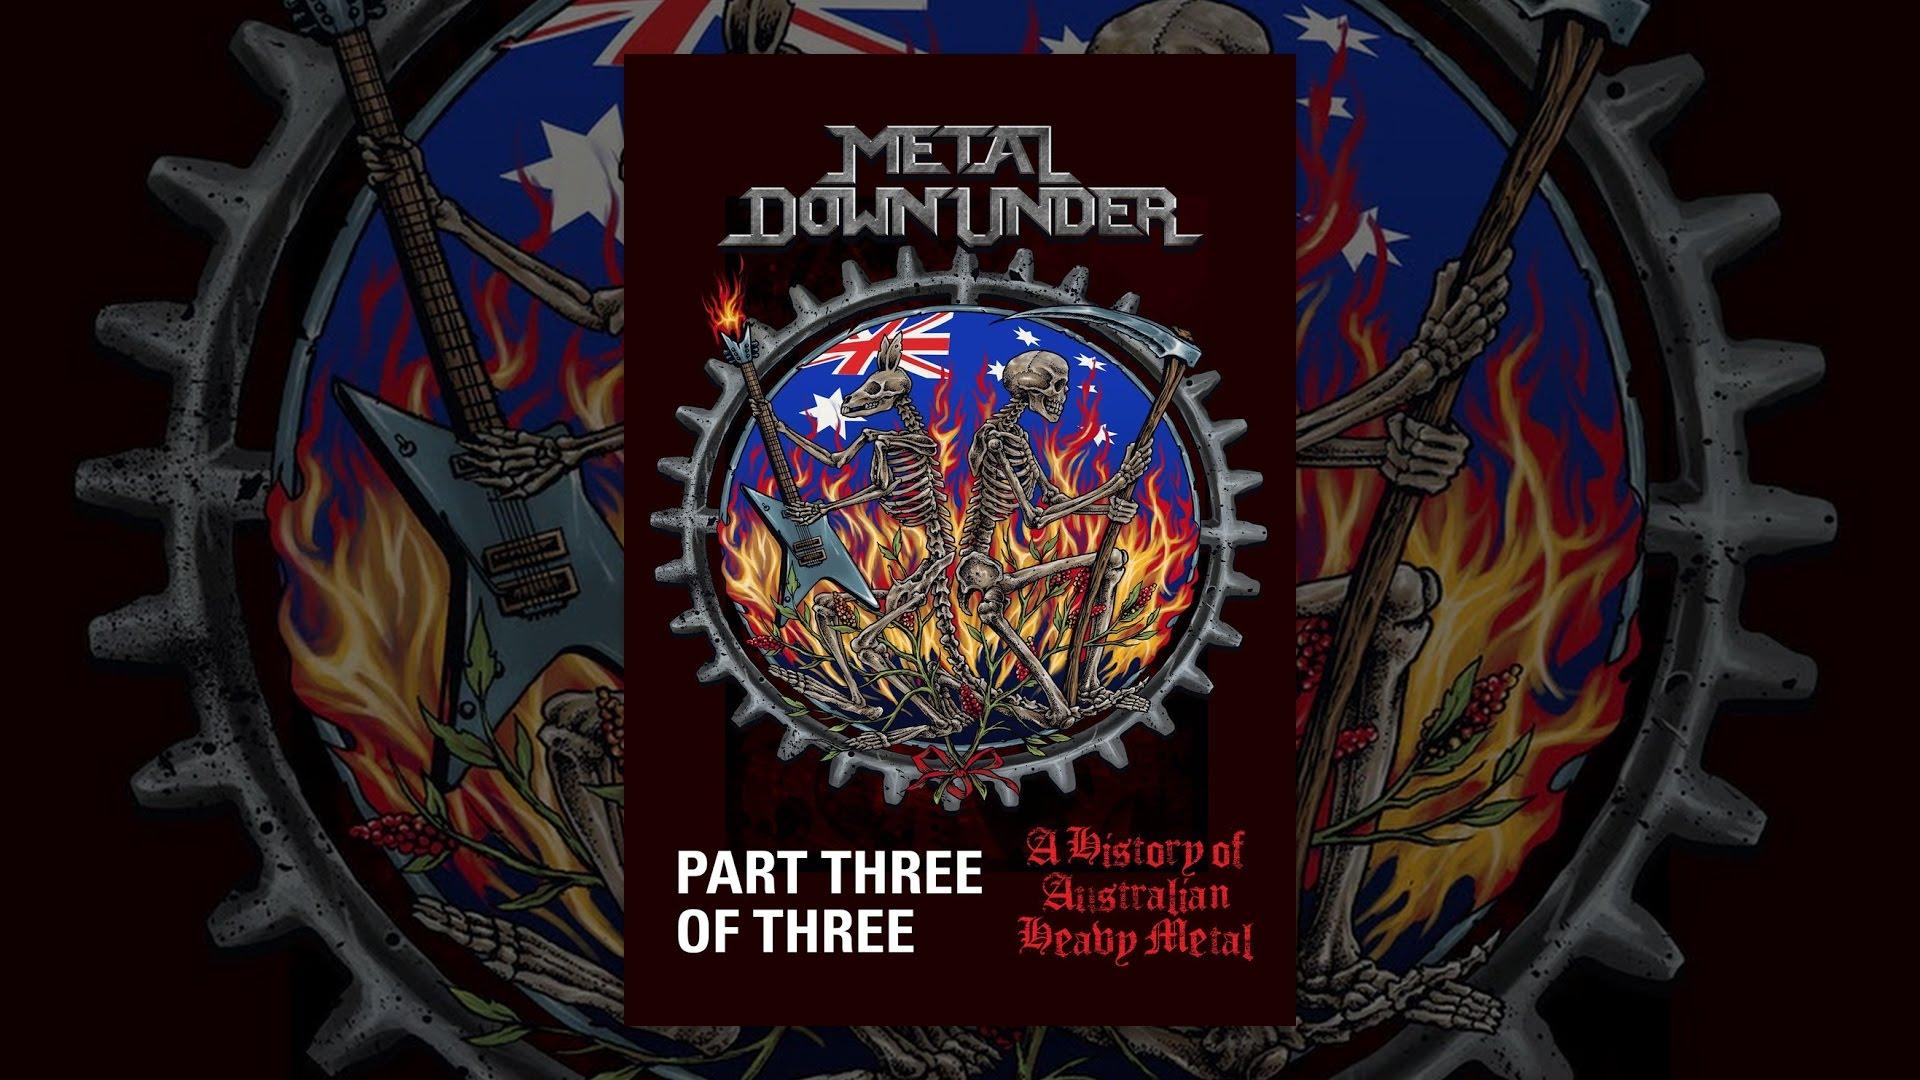 Metal Downunder (A History of Australian Heavy Metal), Part 3